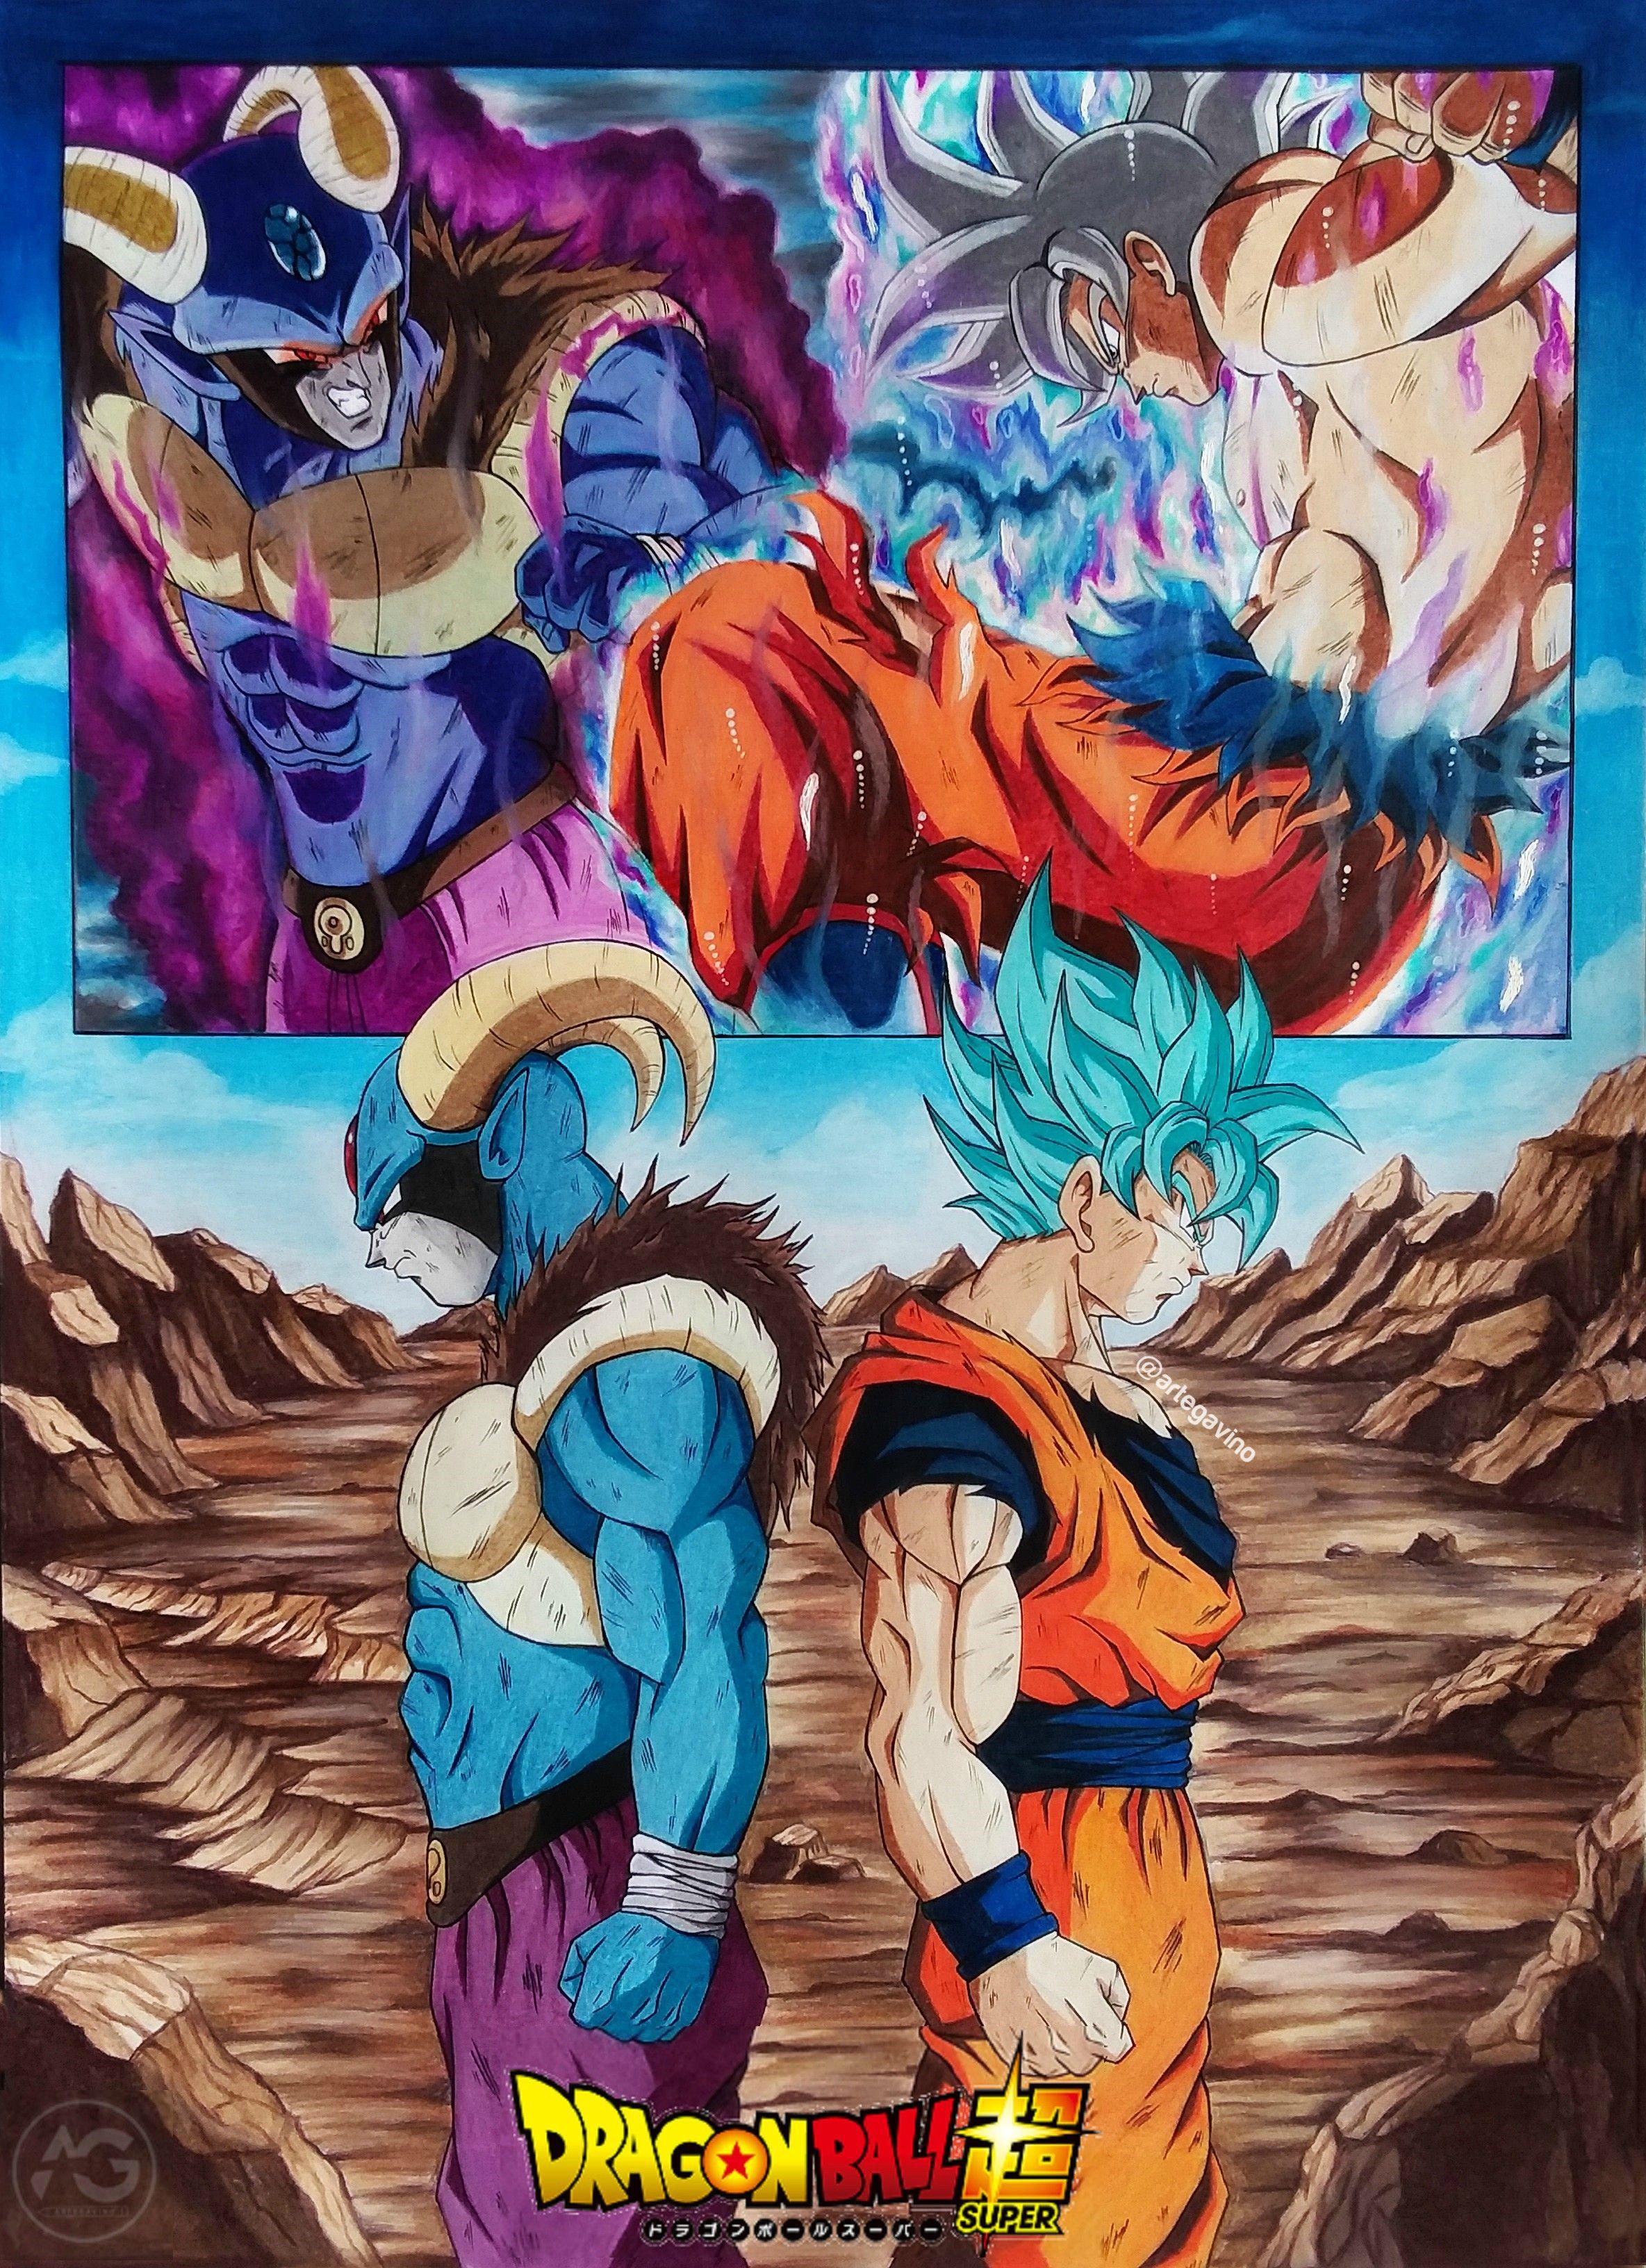 Goku Vs Moro Dragon Ball Super Artwork Dragon Ball Artwork Dragon Ball Art